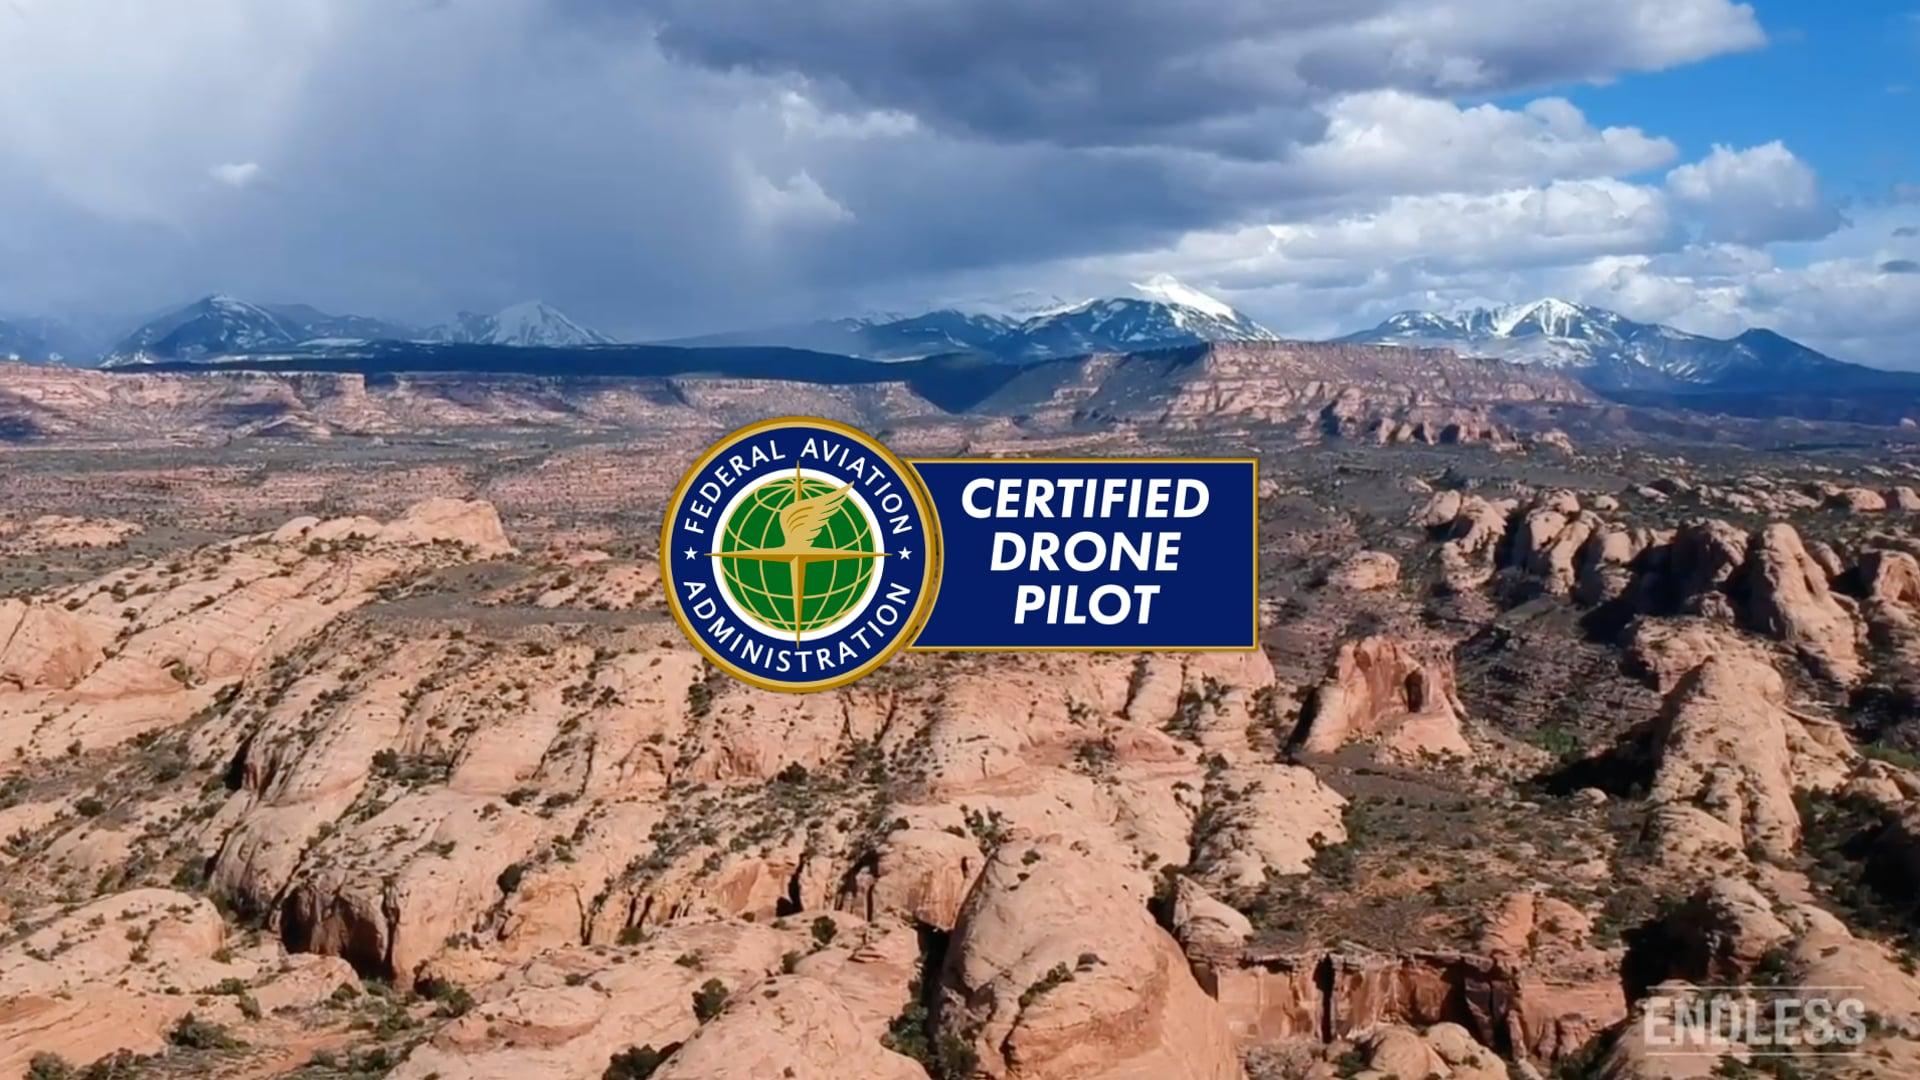 FAA Certified Drone Pilot